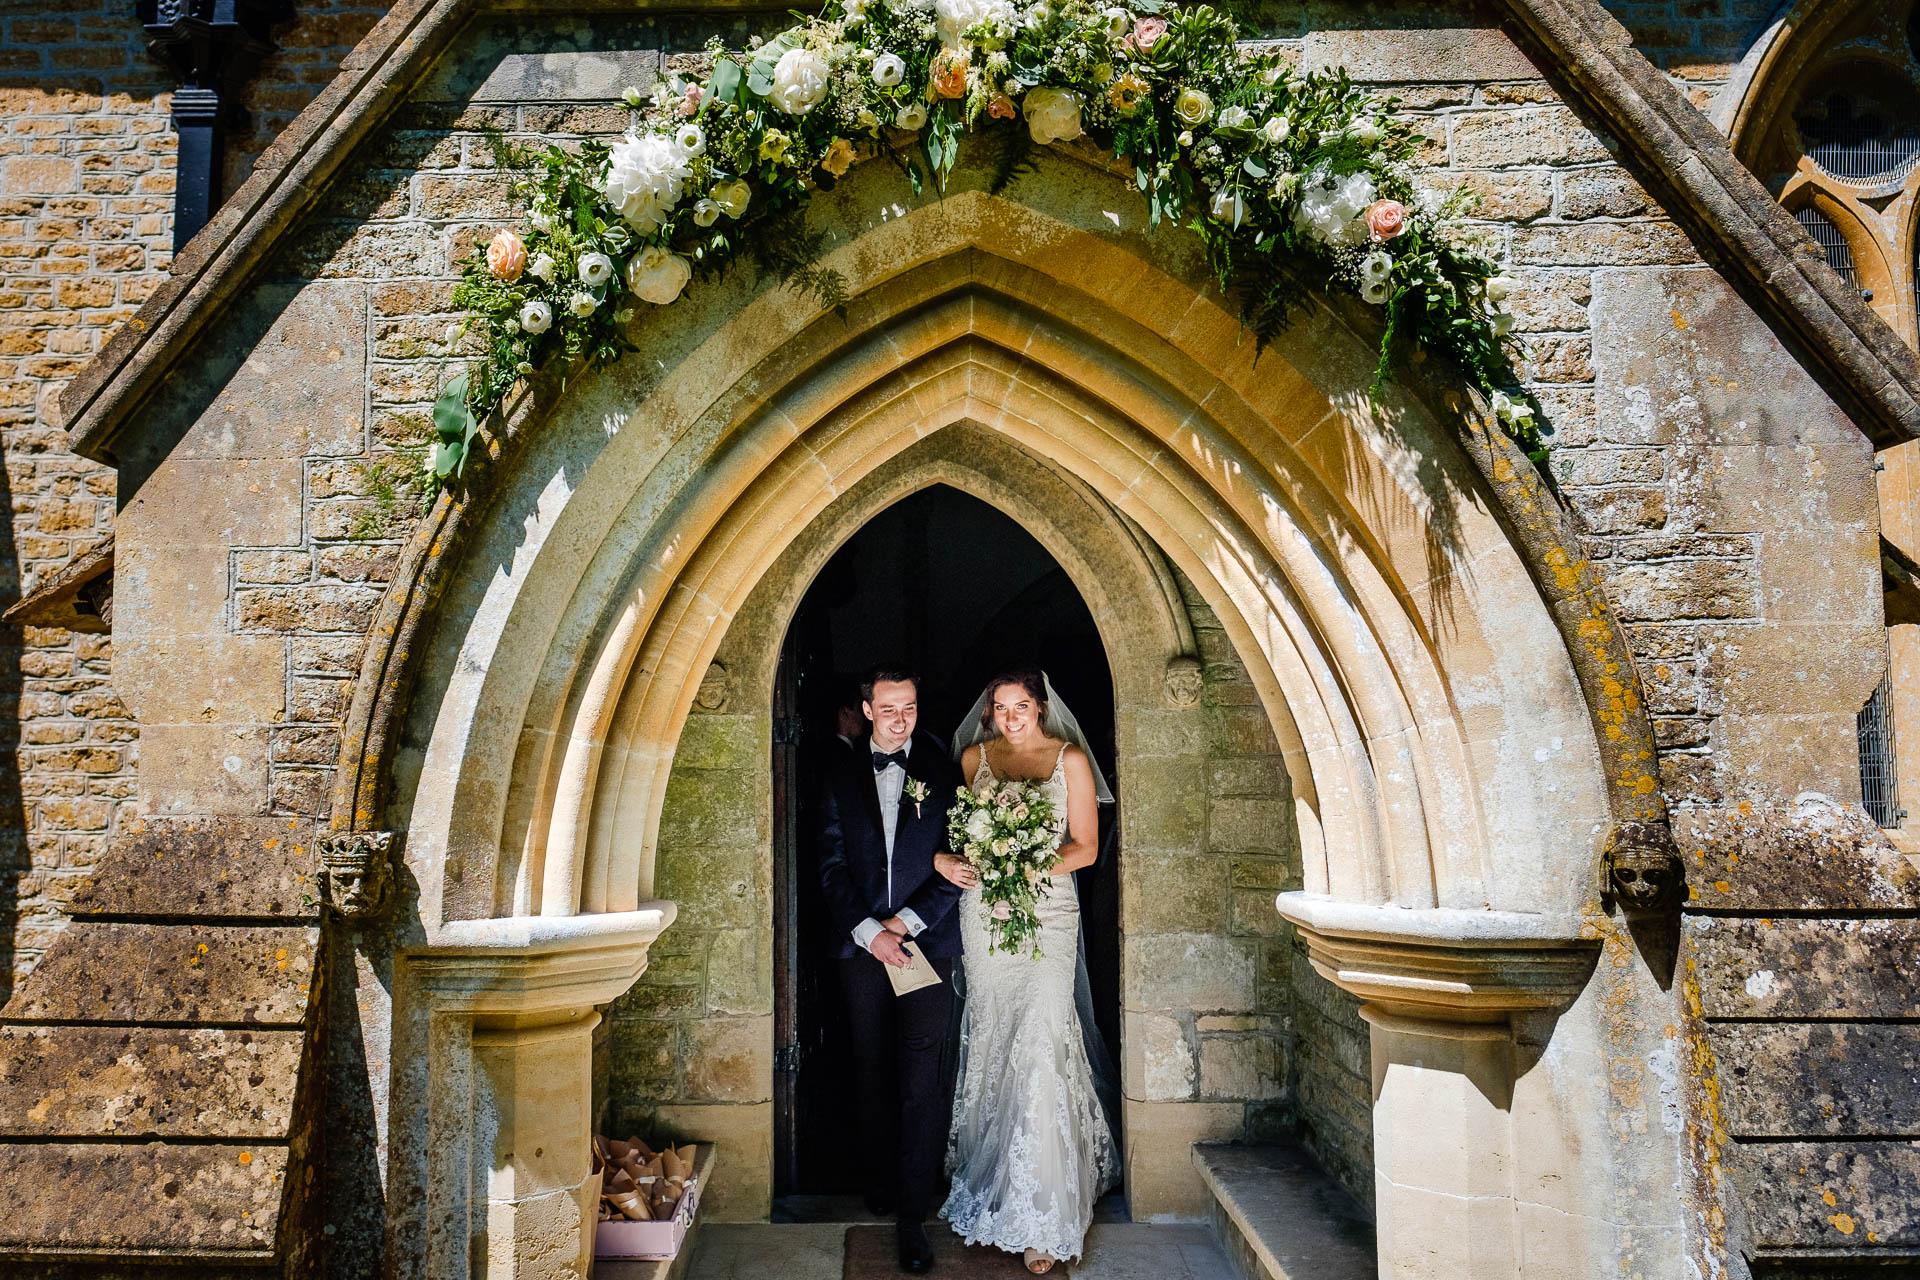 orchardleigh house wedding - Danni & Barney (160).jpg